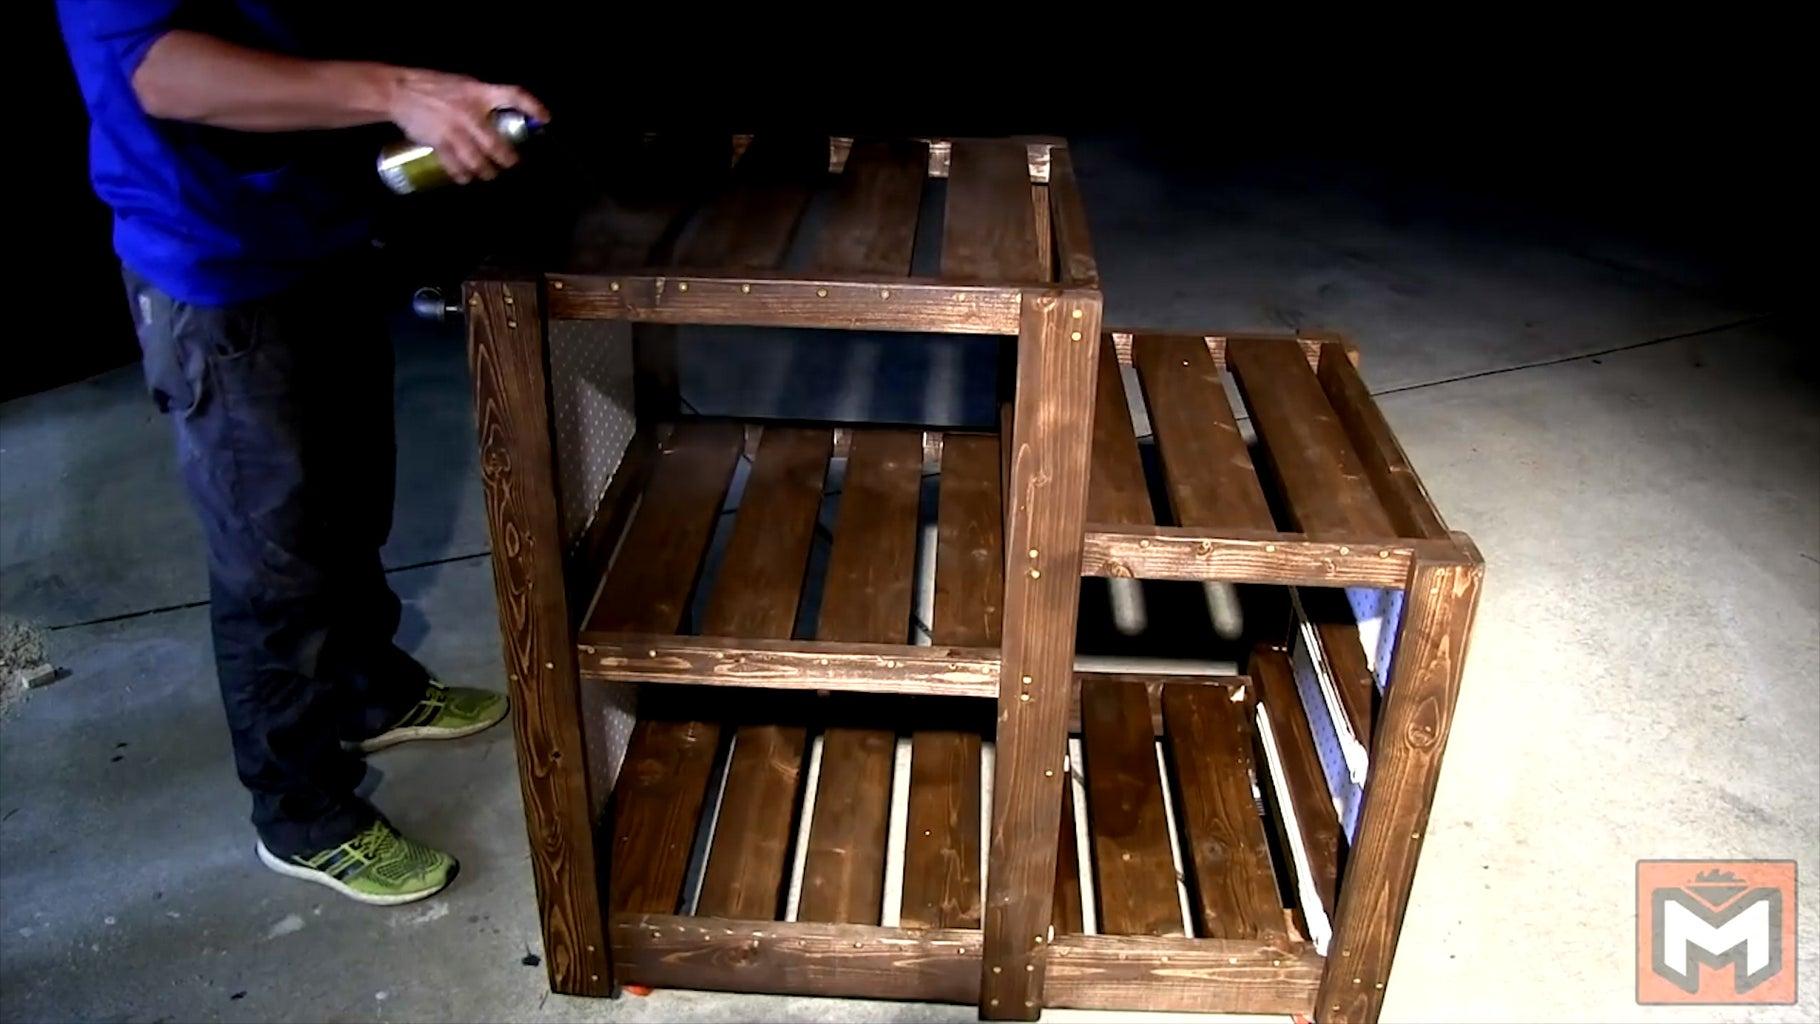 Refining the Cart